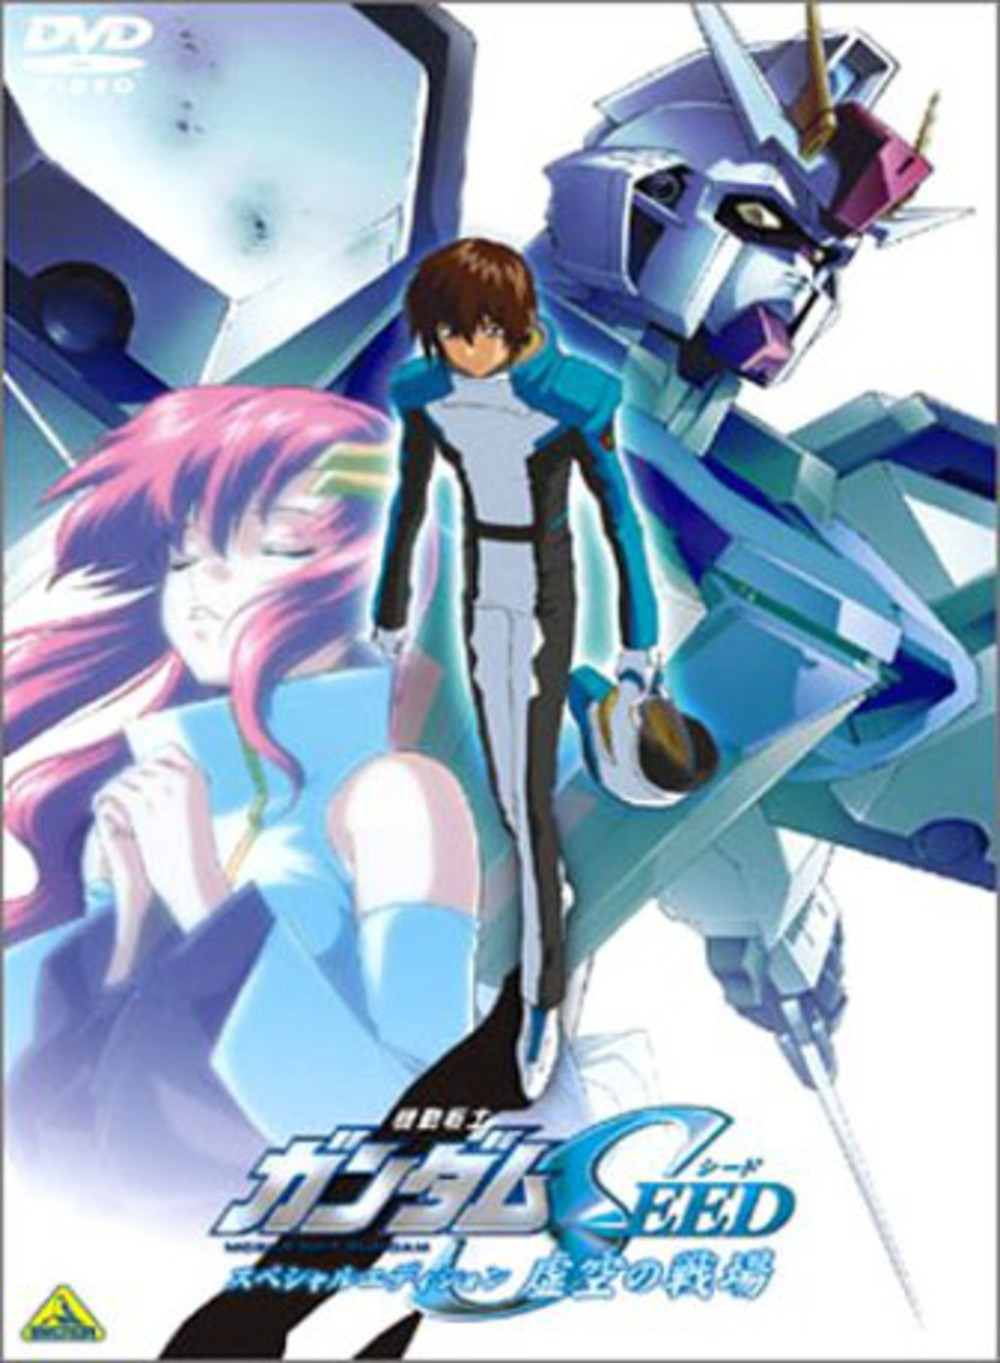 دانلود زیرنویس فارسی فیلم Mobile Suit Gundam SEED: Special Edition I - The Empty Battlefield